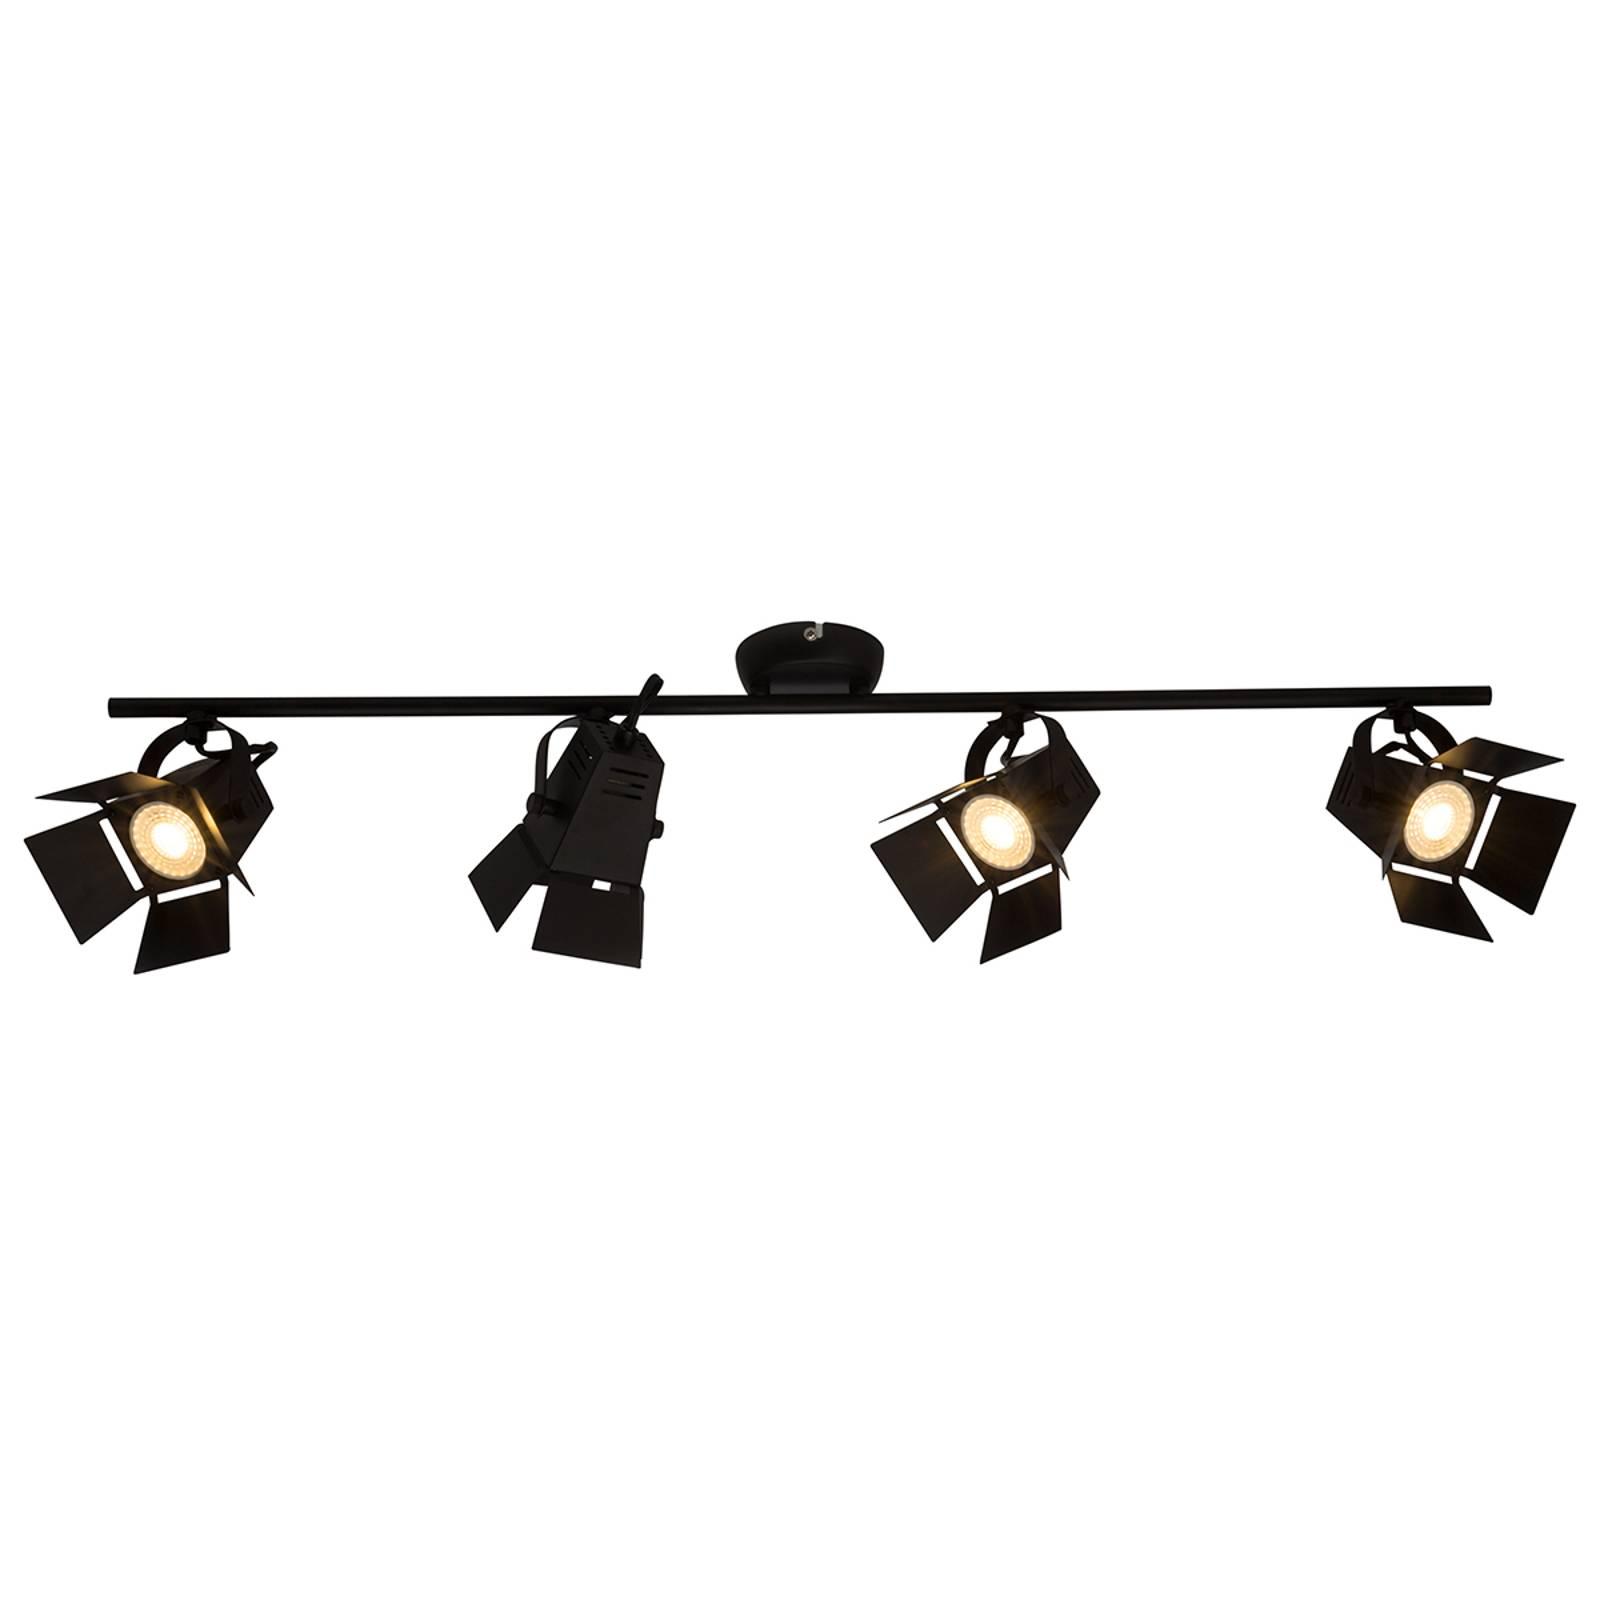 Movie – moderni-LED-kattospotti, musta